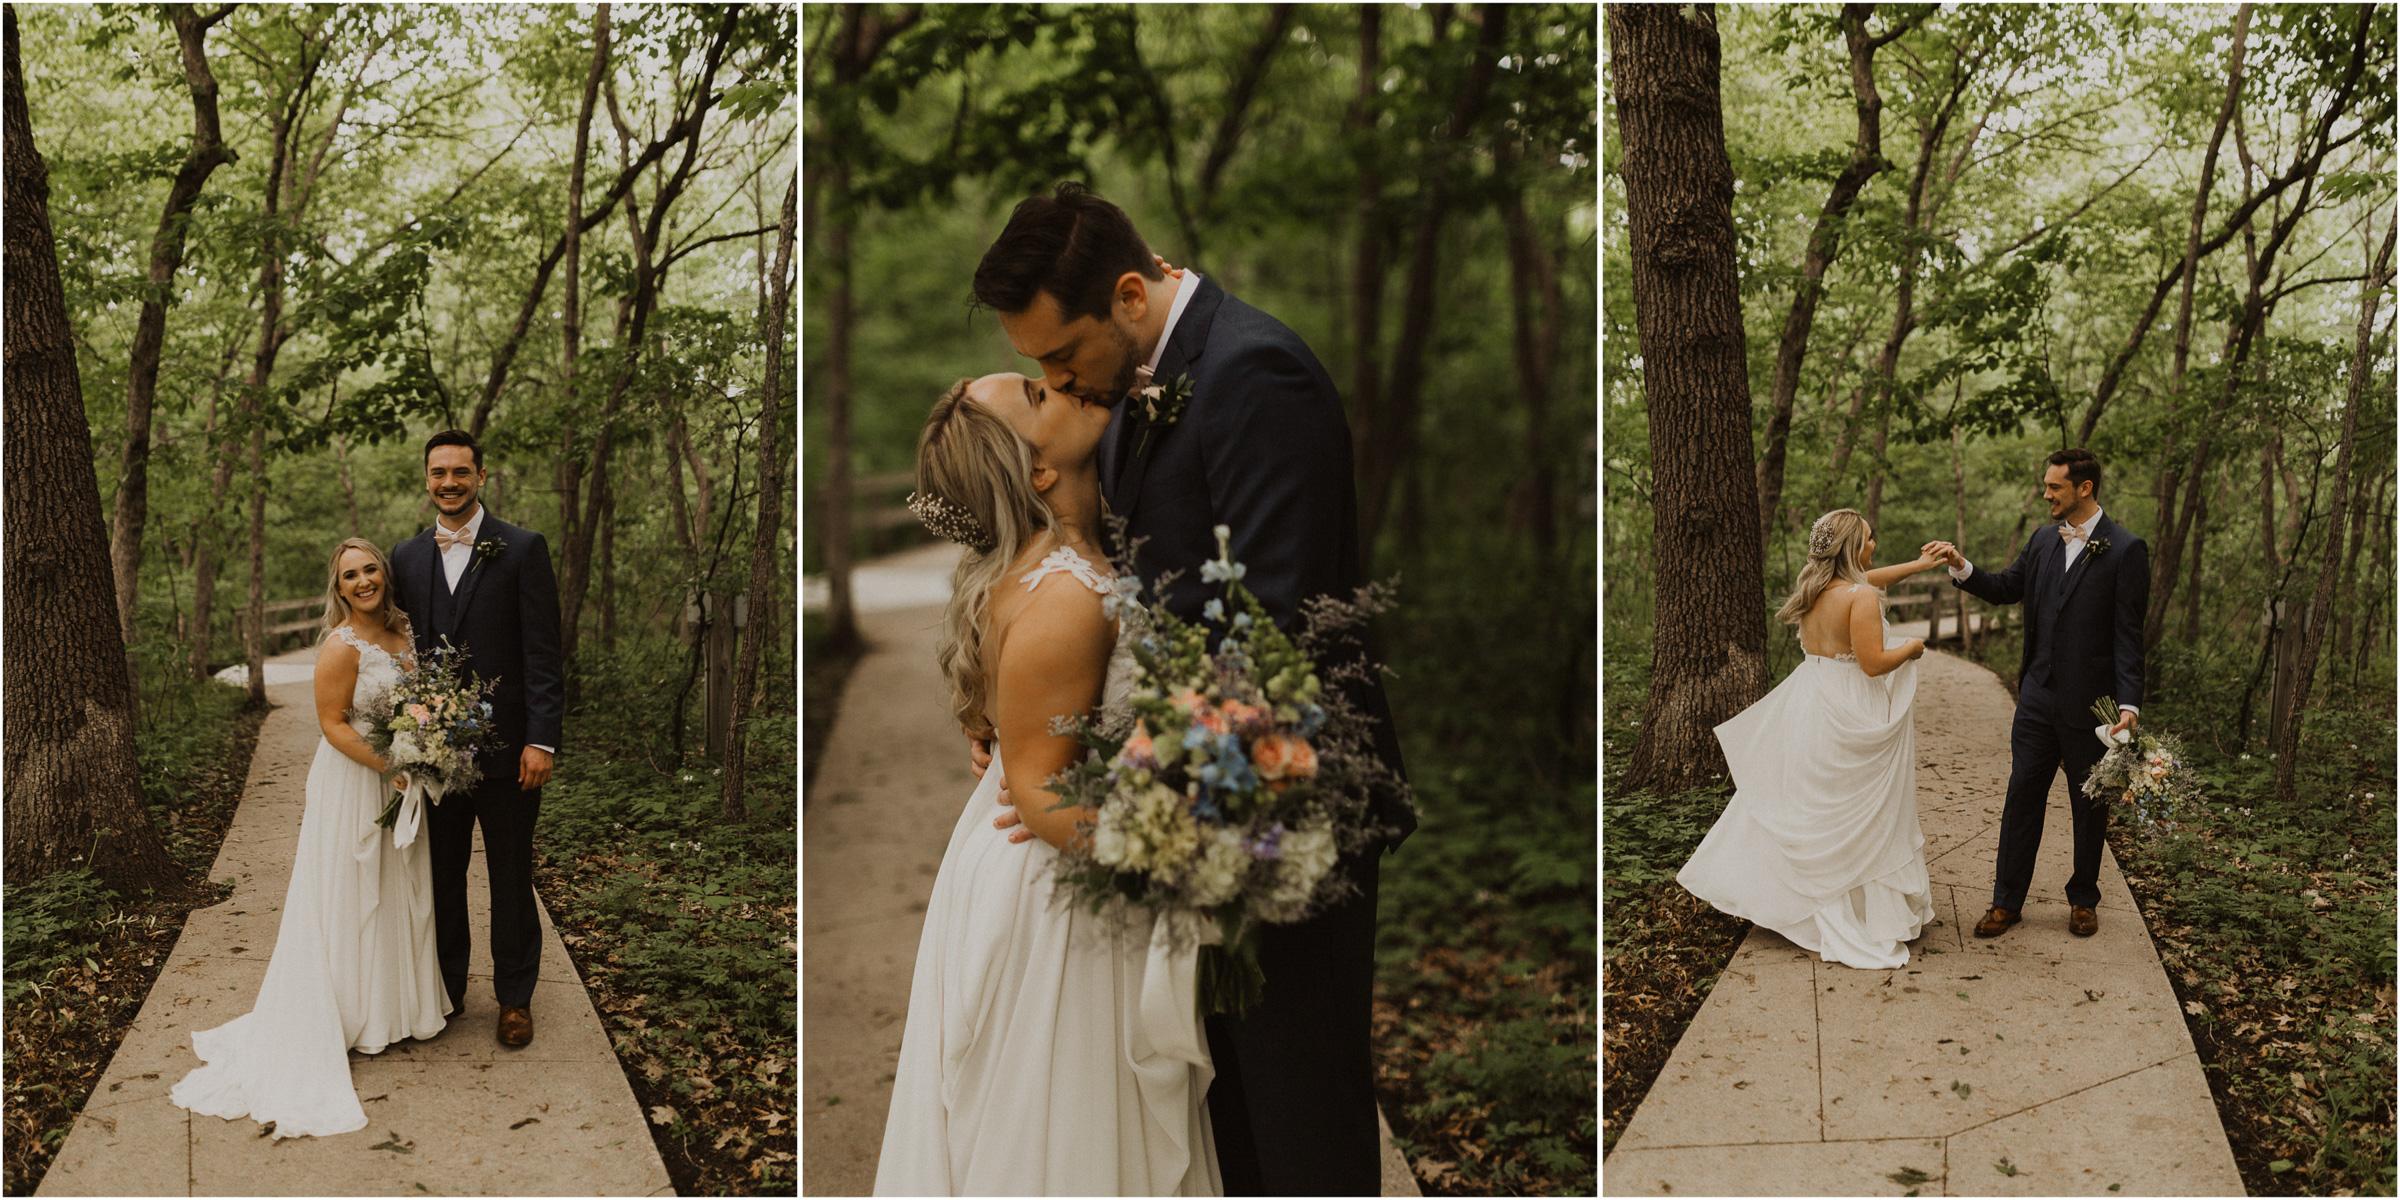 alyssa barletter photography nelson wedding nebraska city lied lodge morton barn spring wedding photographer-14.jpg